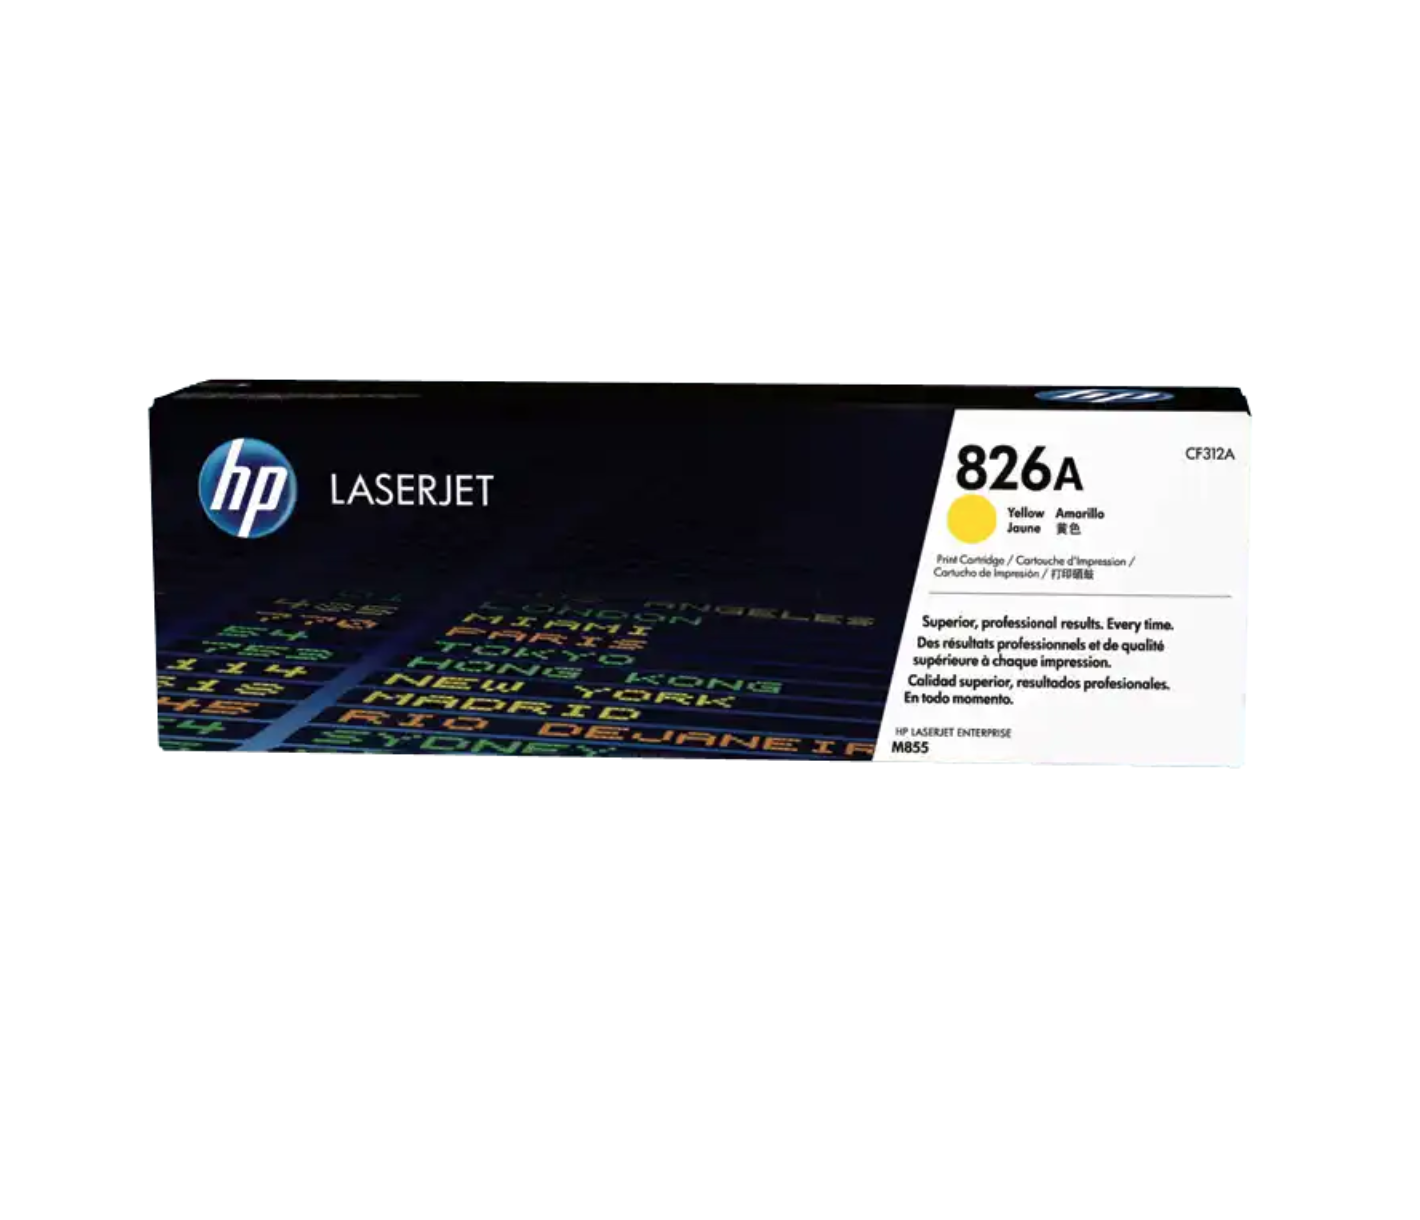 HP 826A 黃色原廠 LaserJet 碳粉 CF312A